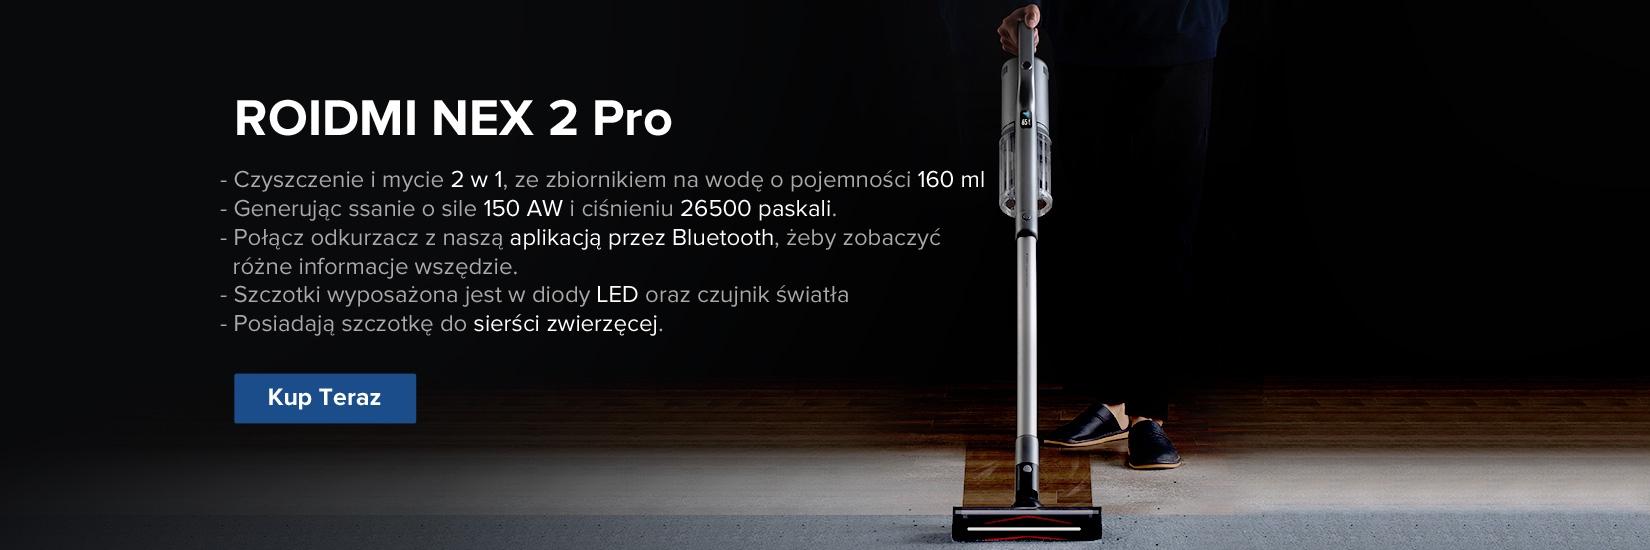 Roidmi NEX 2 Pro